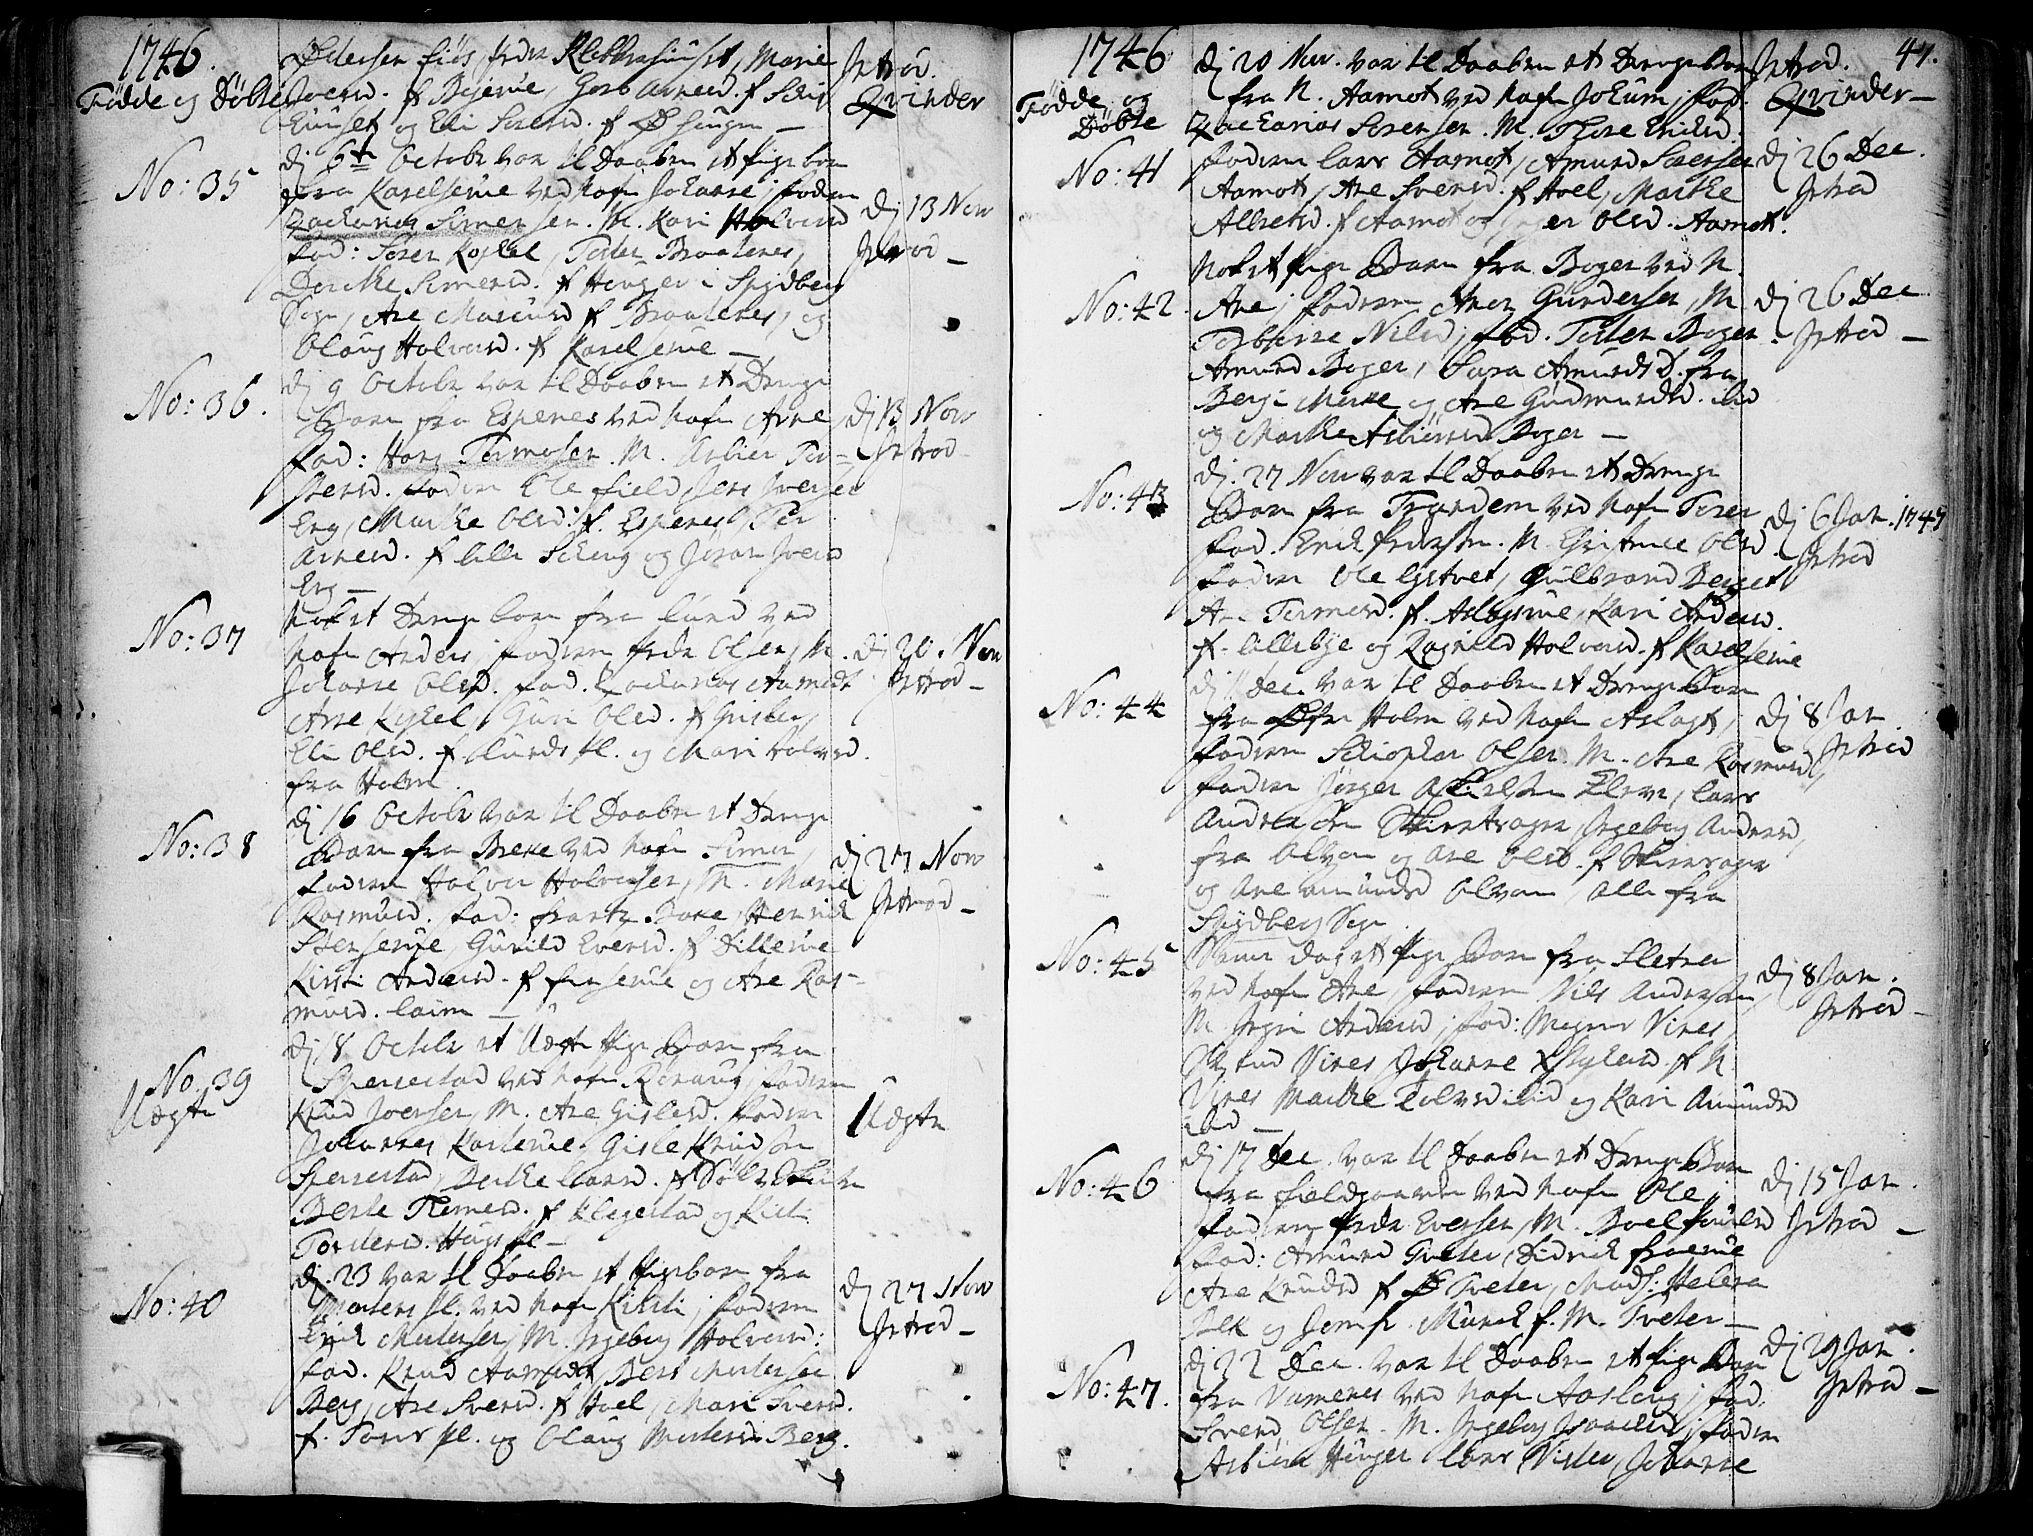 SAO, Skiptvet prestekontor Kirkebøker, F/Fa/L0002: Ministerialbok nr. 2, 1734-1759, s. 47